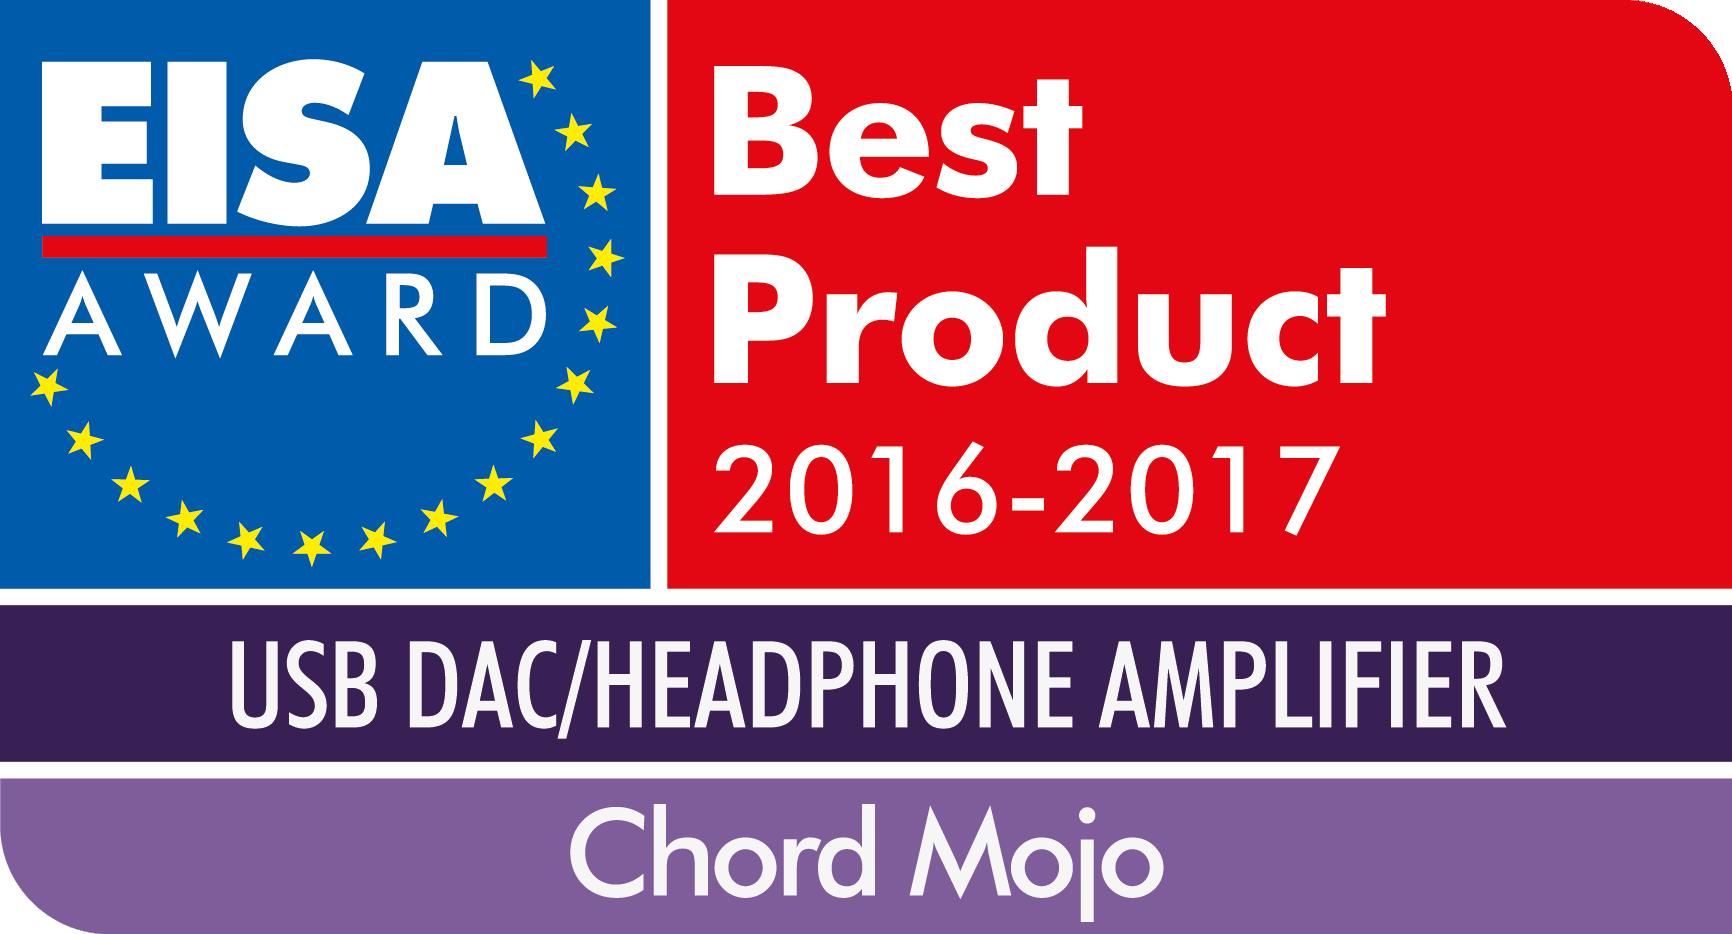 EUROPEAN-USB-DAC-HEADPHONE-AMPLIFIER-2016-2017-Chord-Mojo.png